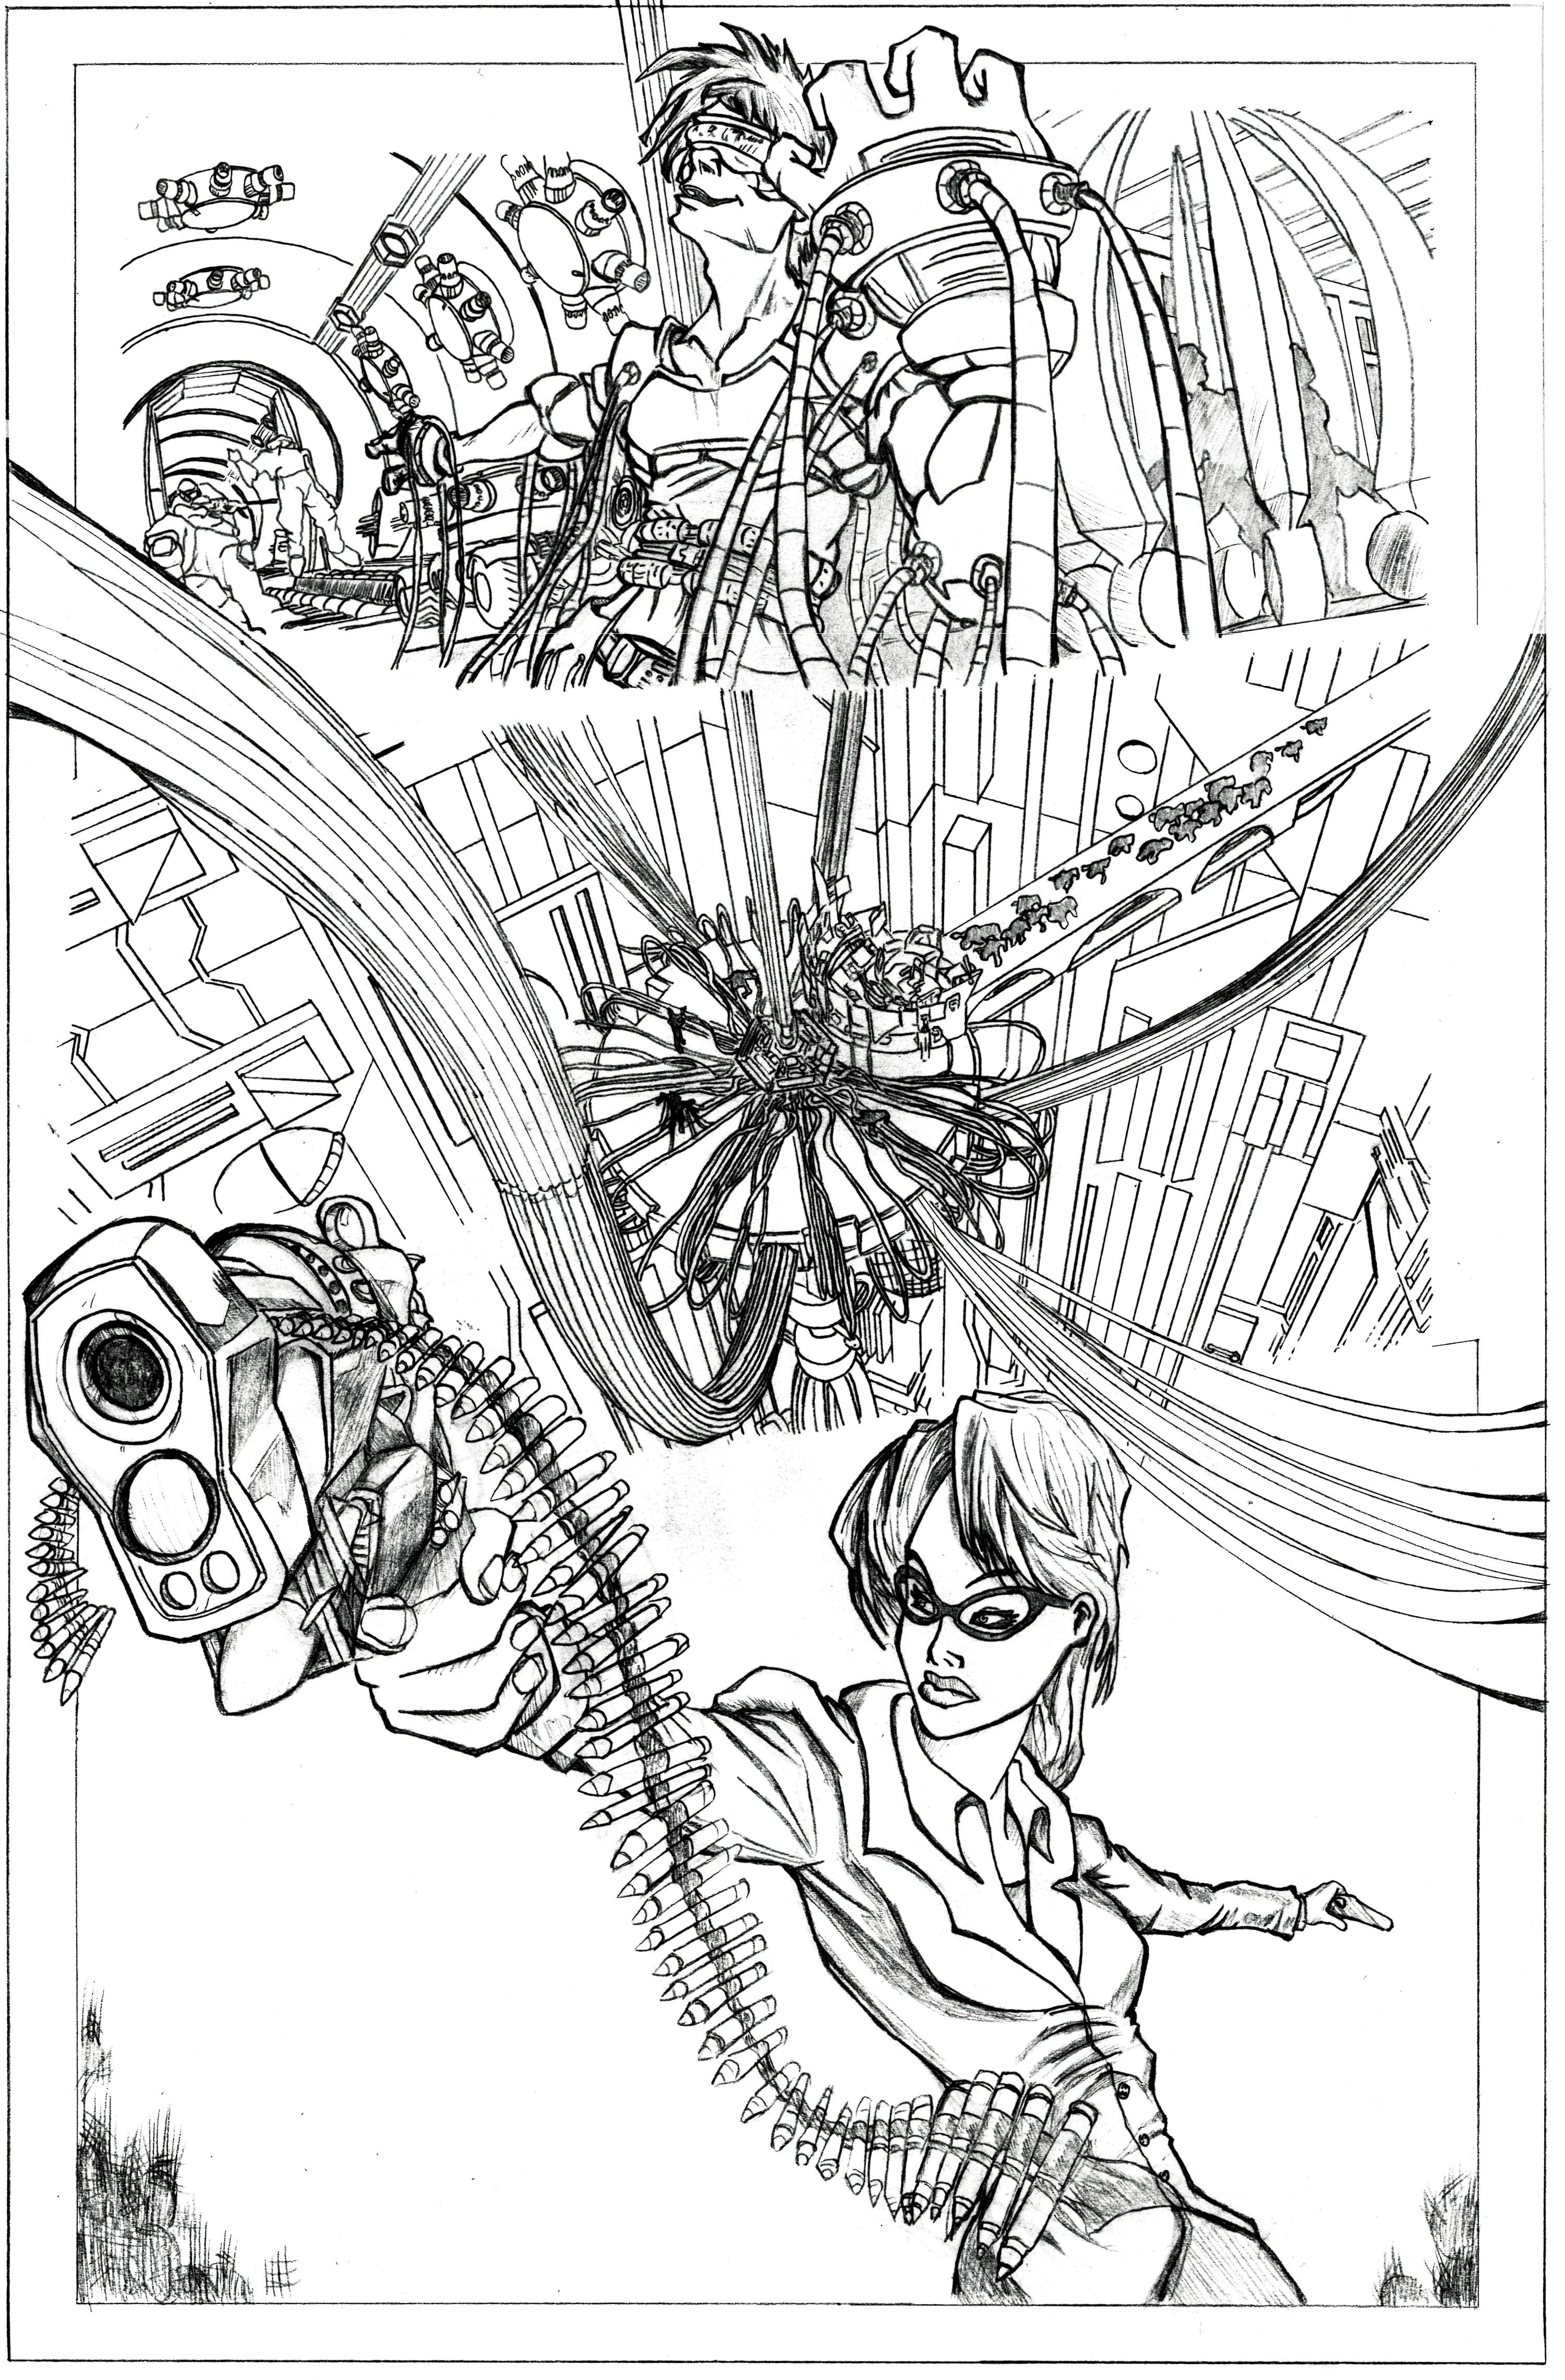 SHADOV preview v.4- t2, pencil.